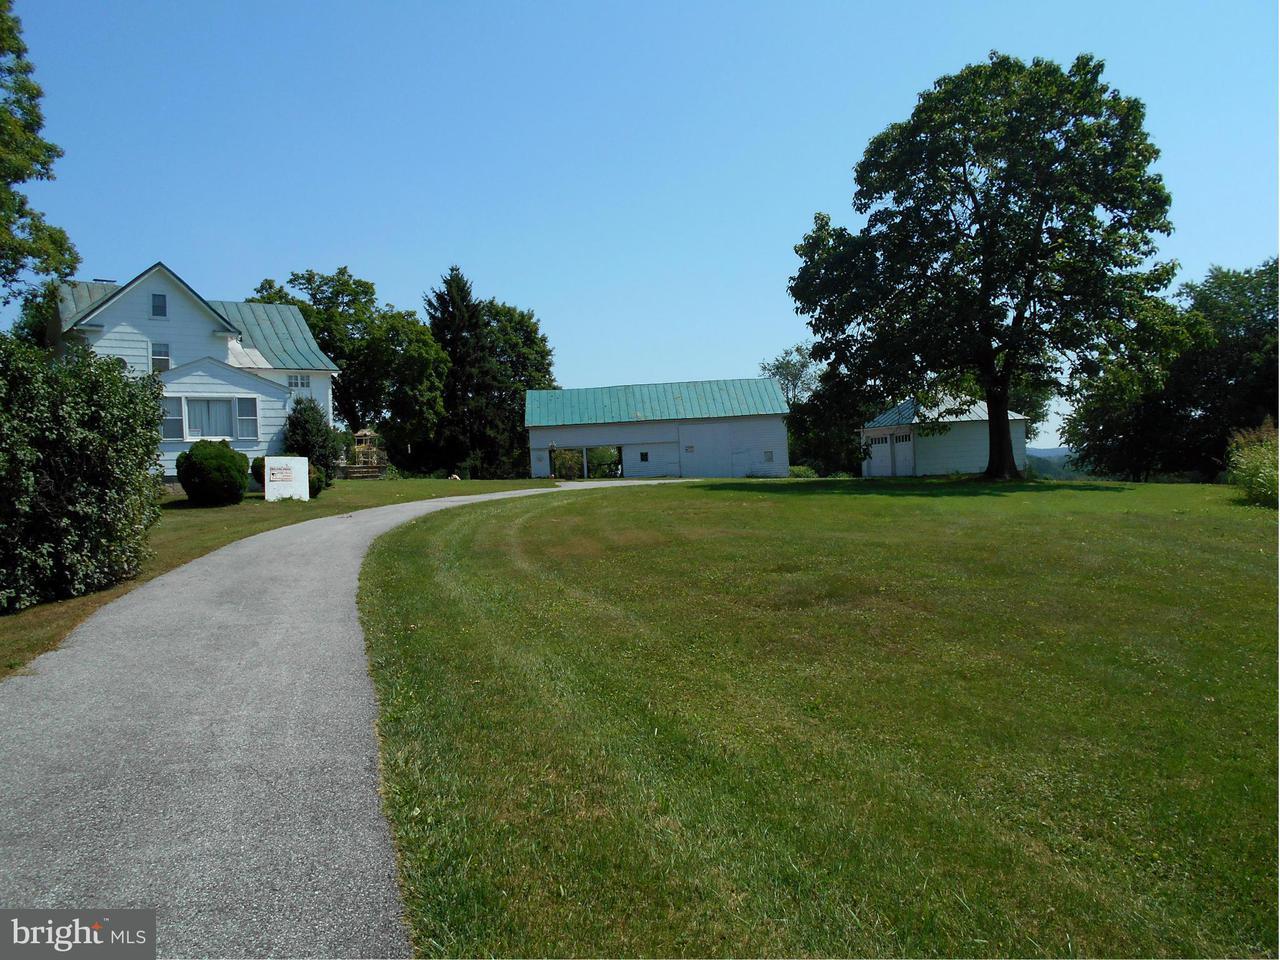 独户住宅 为 销售 在 3401 OLD GAMBER ROAD 3401 OLD GAMBER ROAD Finksburg, 马里兰州 21048 美国